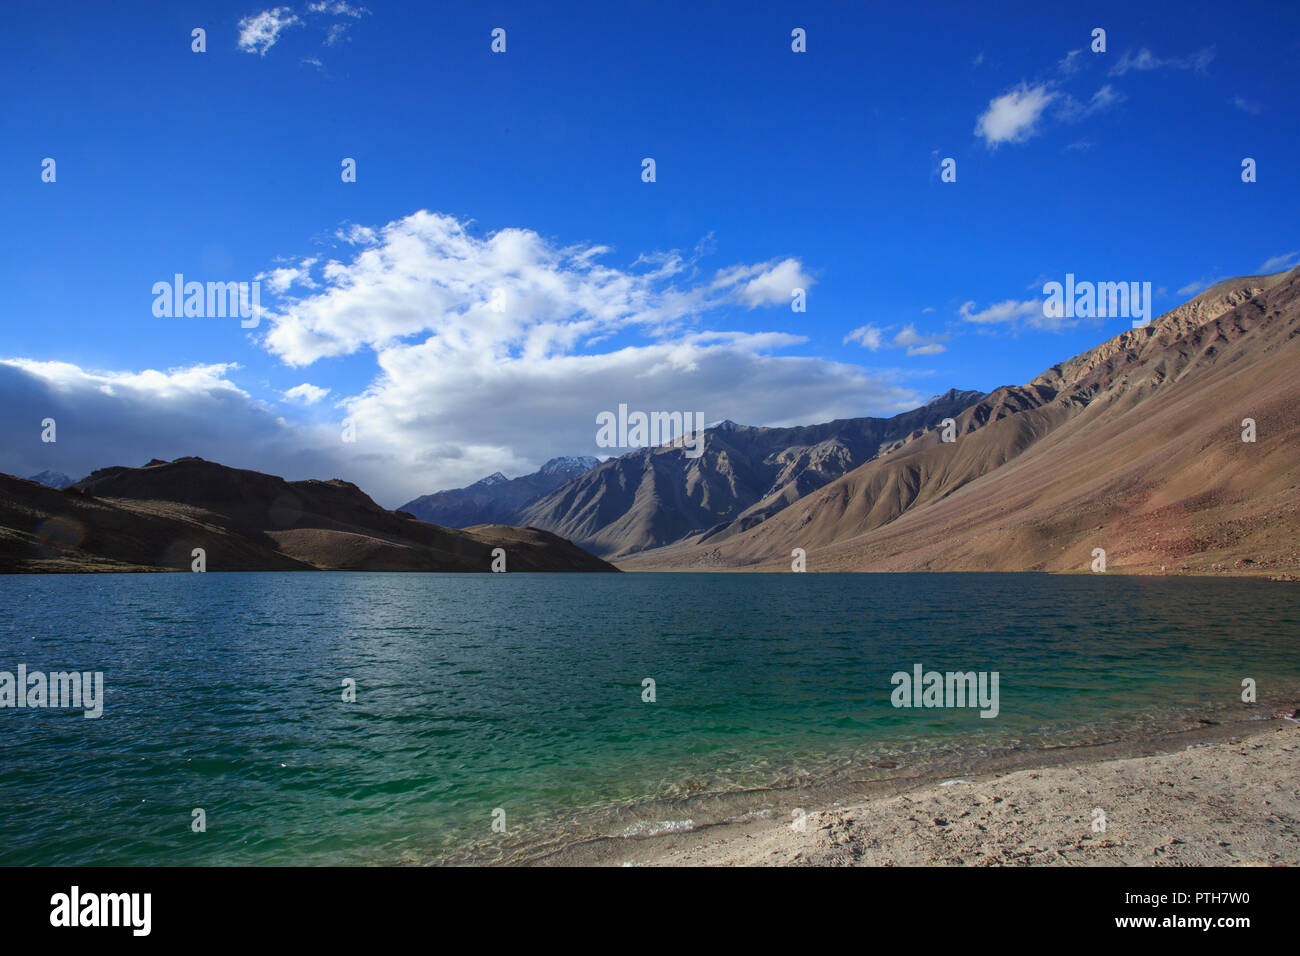 Chandratal, a high altitude lake in Himachal Pradesh, India - Stock Image